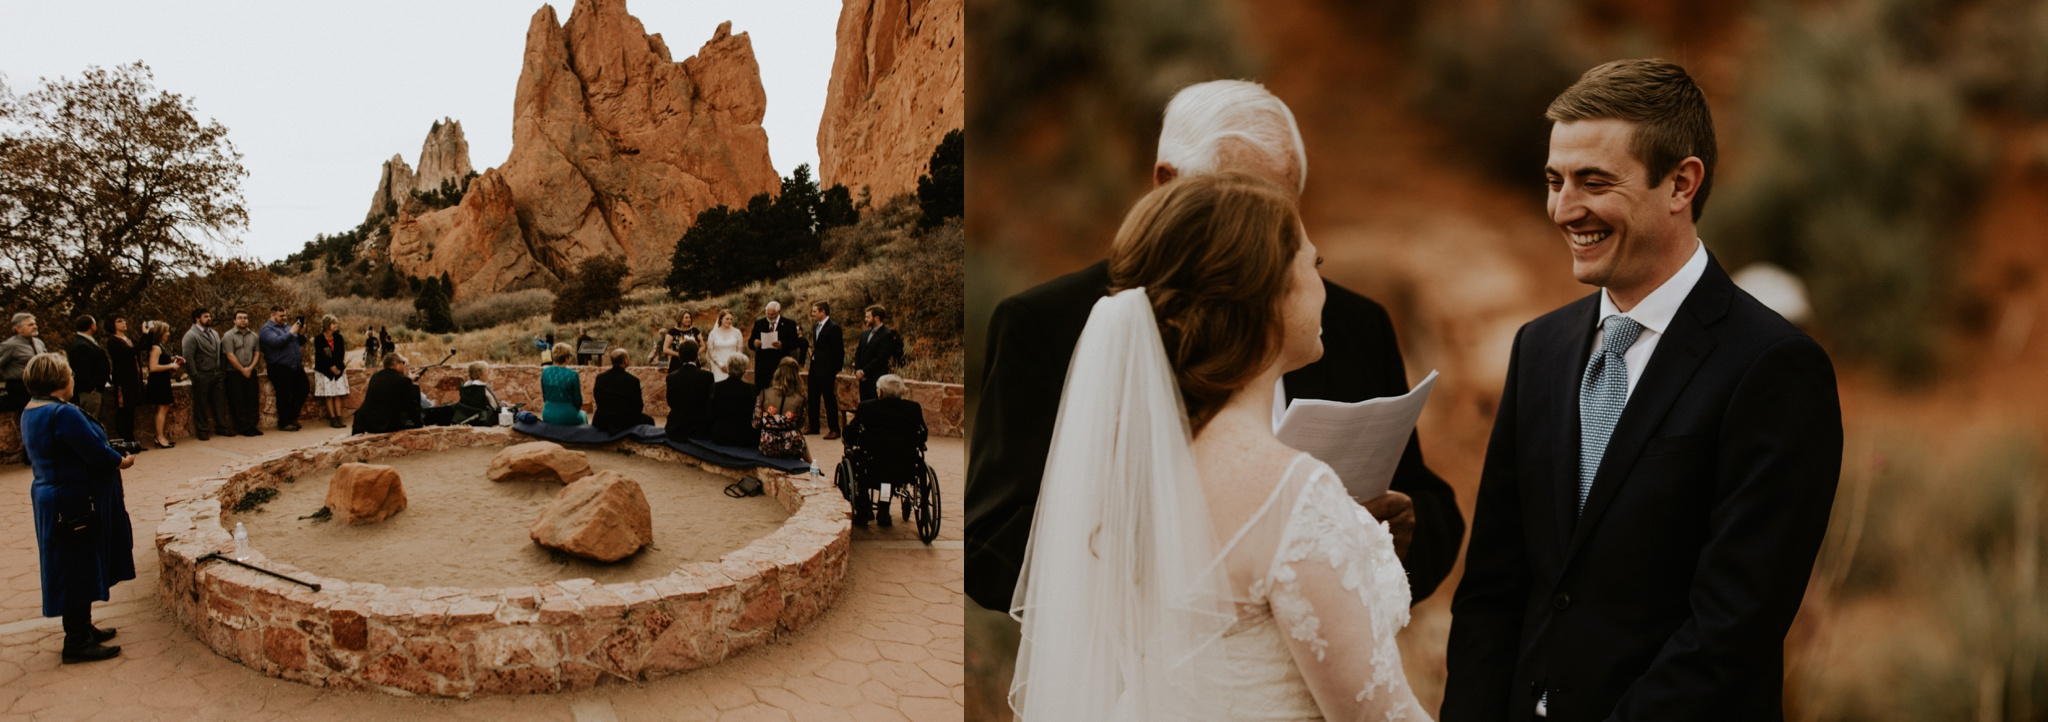 trinjensen photography, nebraska outdoor wedding photographer_2830.jpg